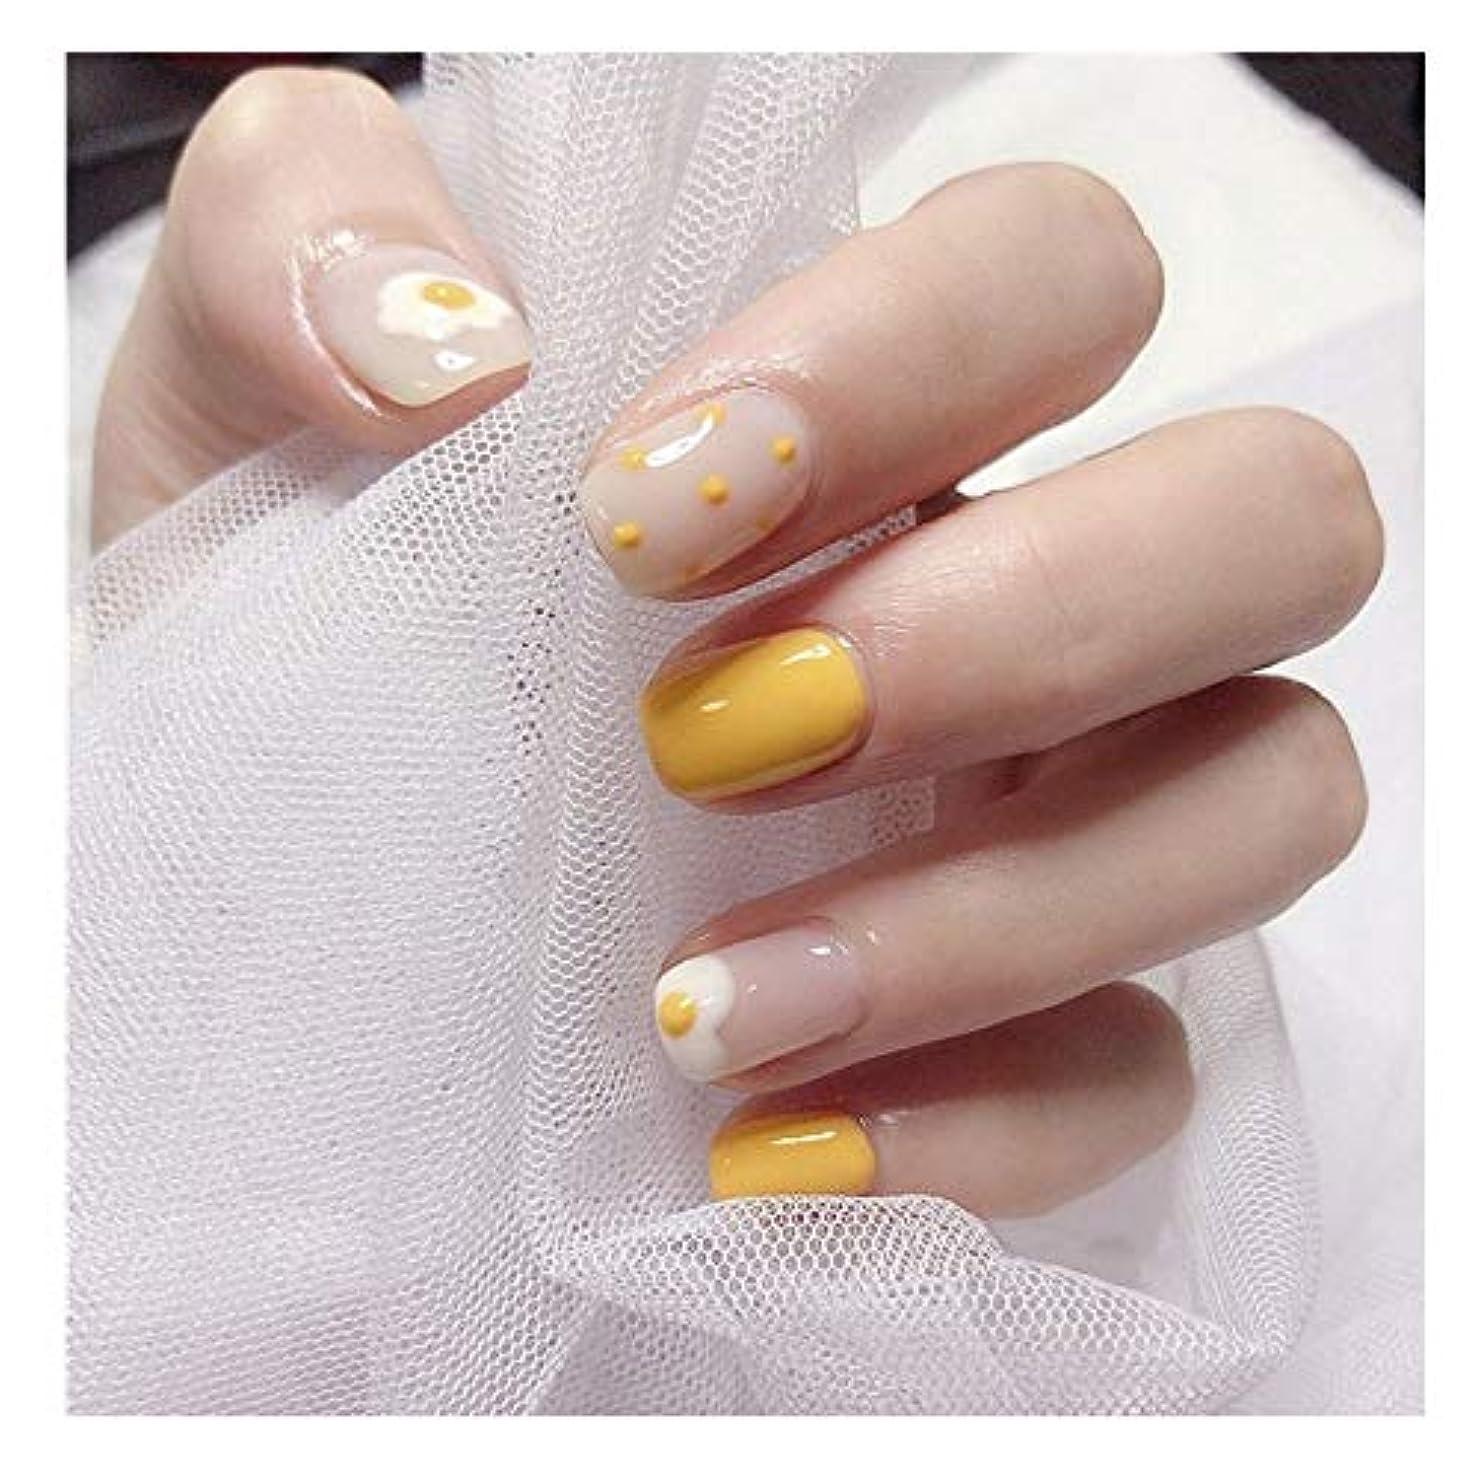 TAALESET 黄色の卵偽の釘のショートスクエアネイルグルー完成ネイルアートフェイクネイルズ (色 : 24 pieces)